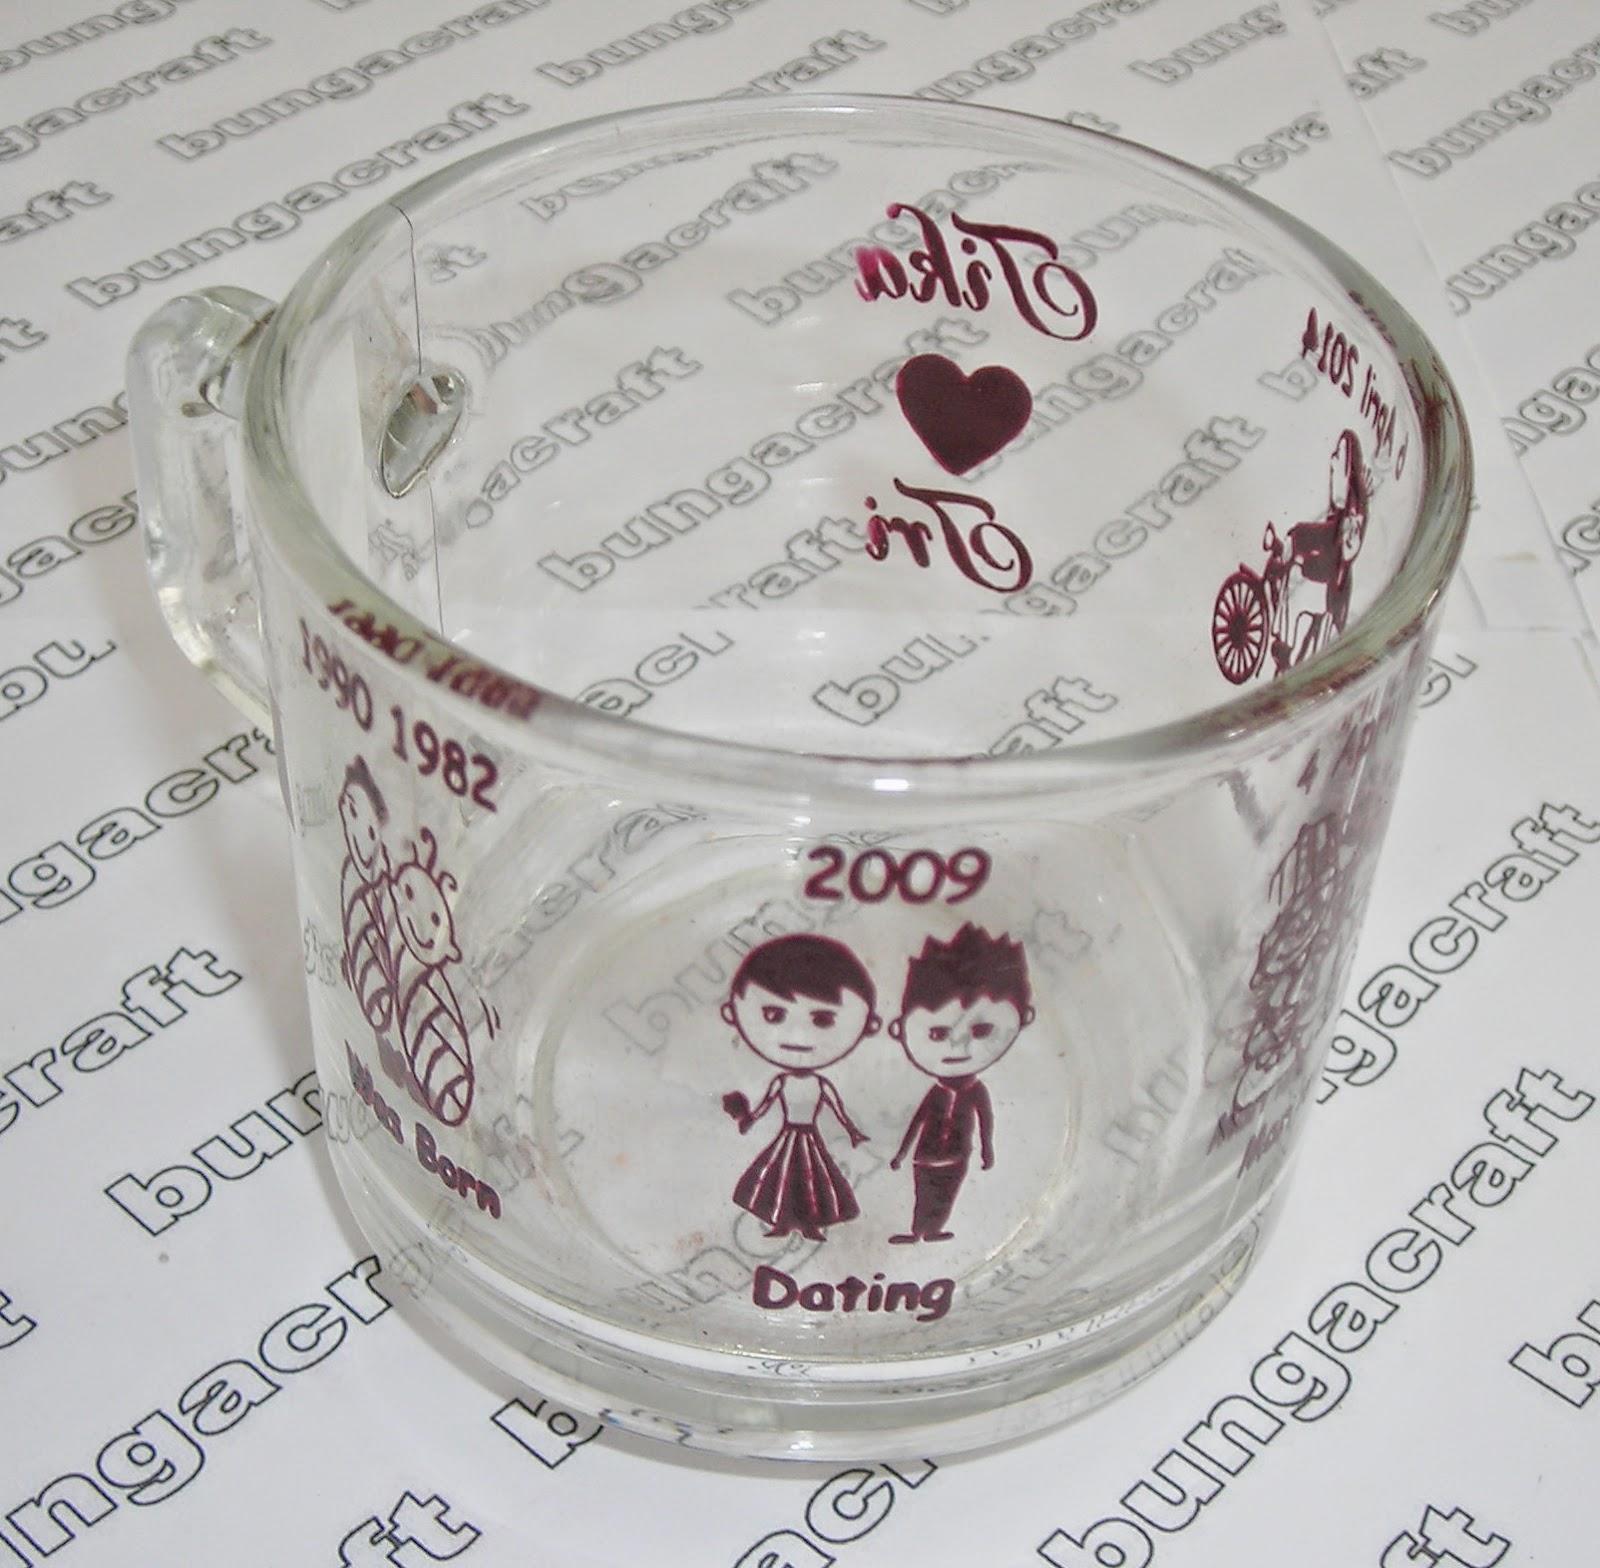 souvenir gelas cangkir